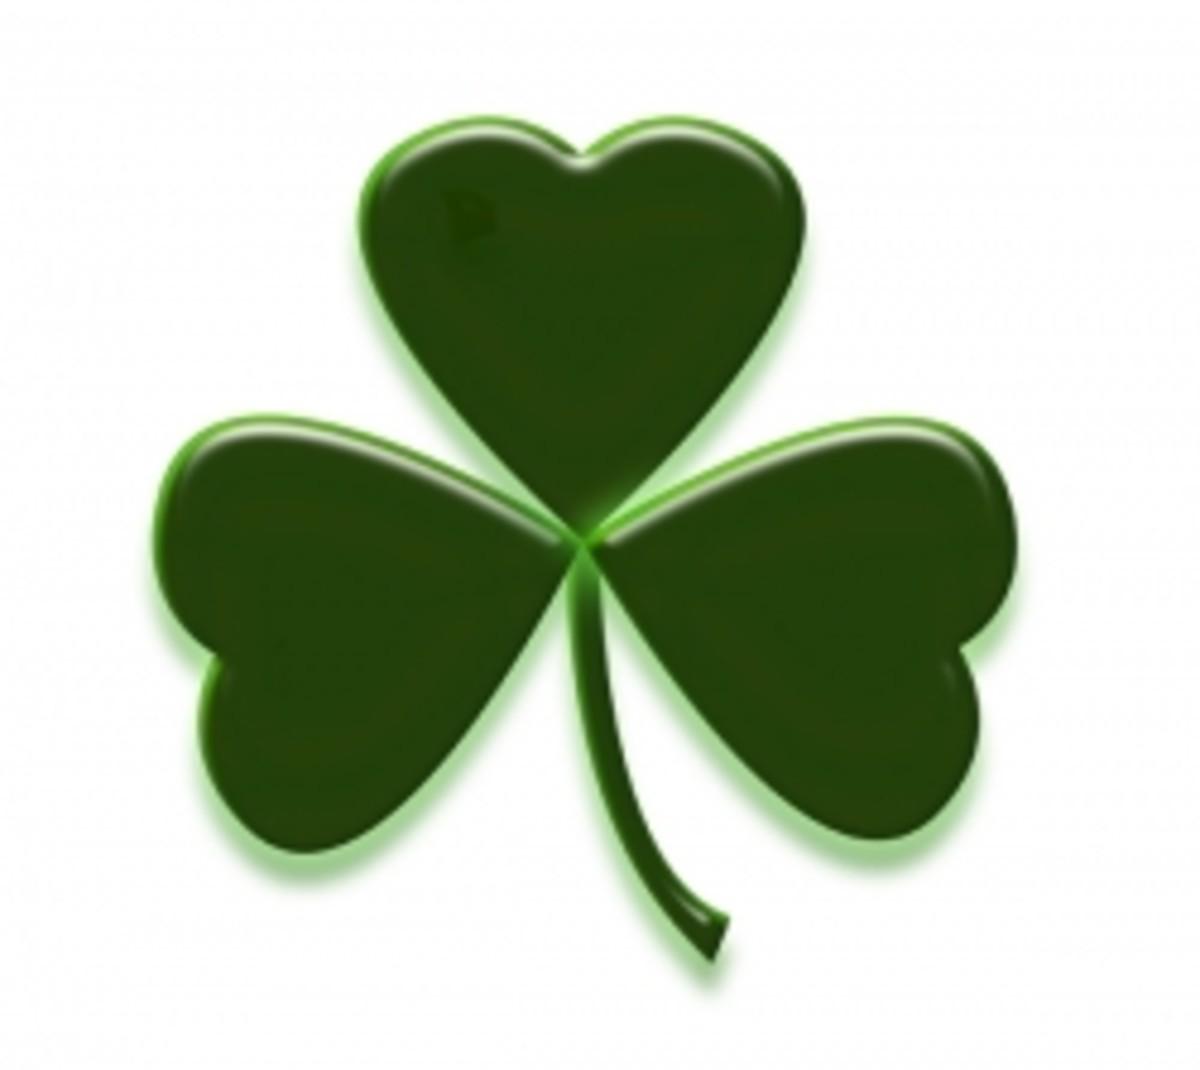 Free St. Patrick's Day Shamrocks Clip Art Images